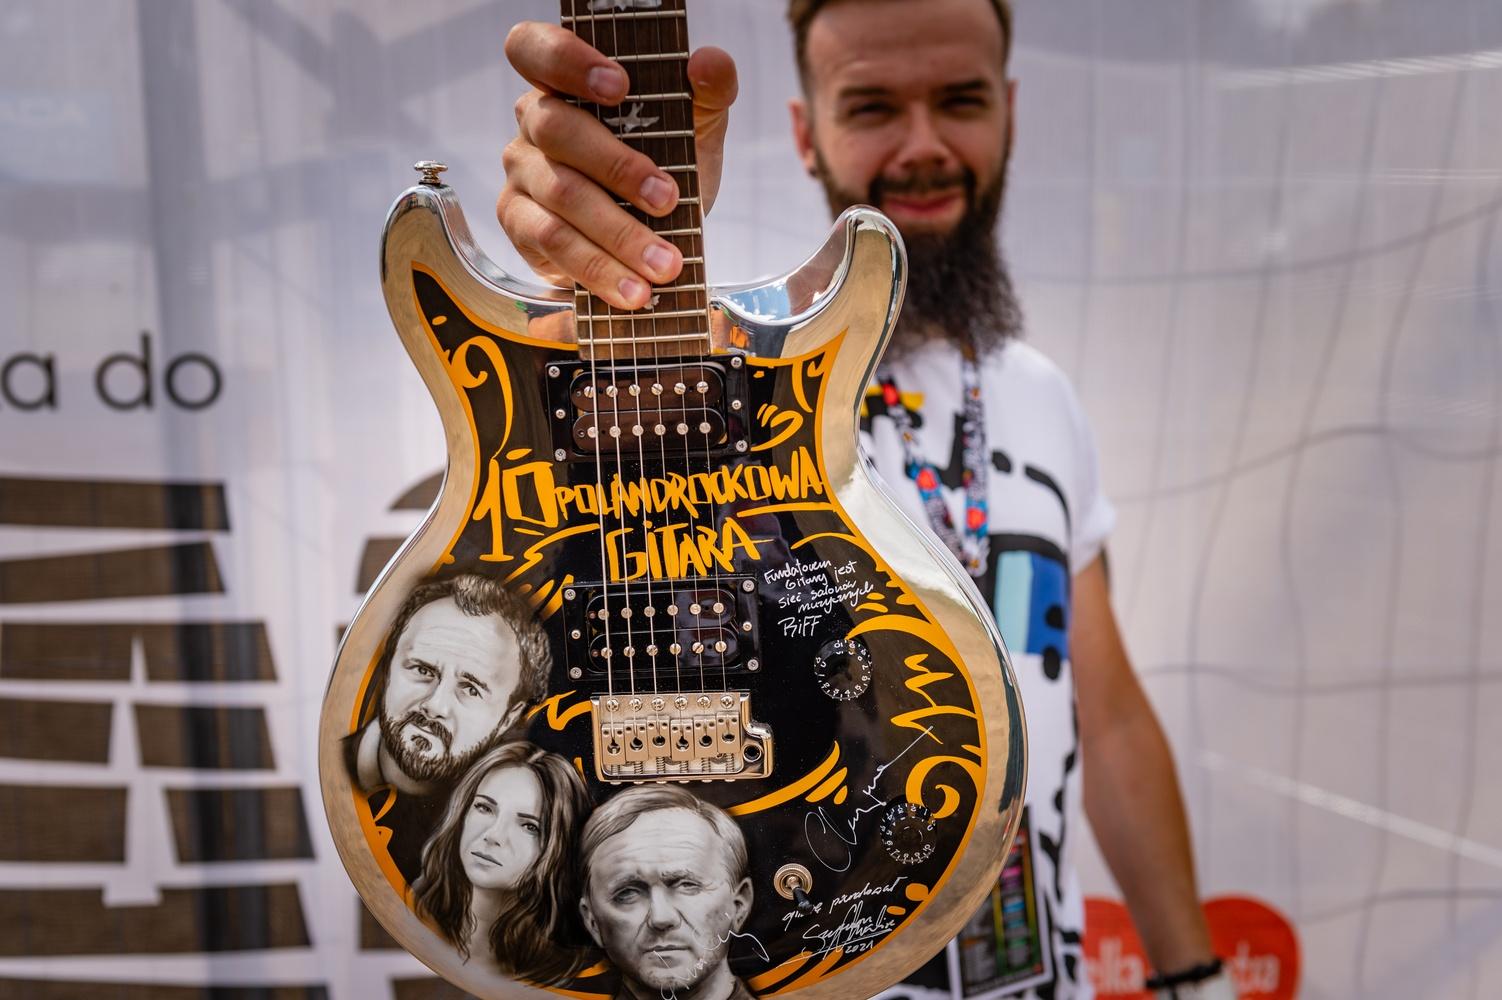 Front of the guitar with images of Arkadiusz Jakubik, Kasia Kowalska and Andrzej Chyra. Photographer Pawel Krupka